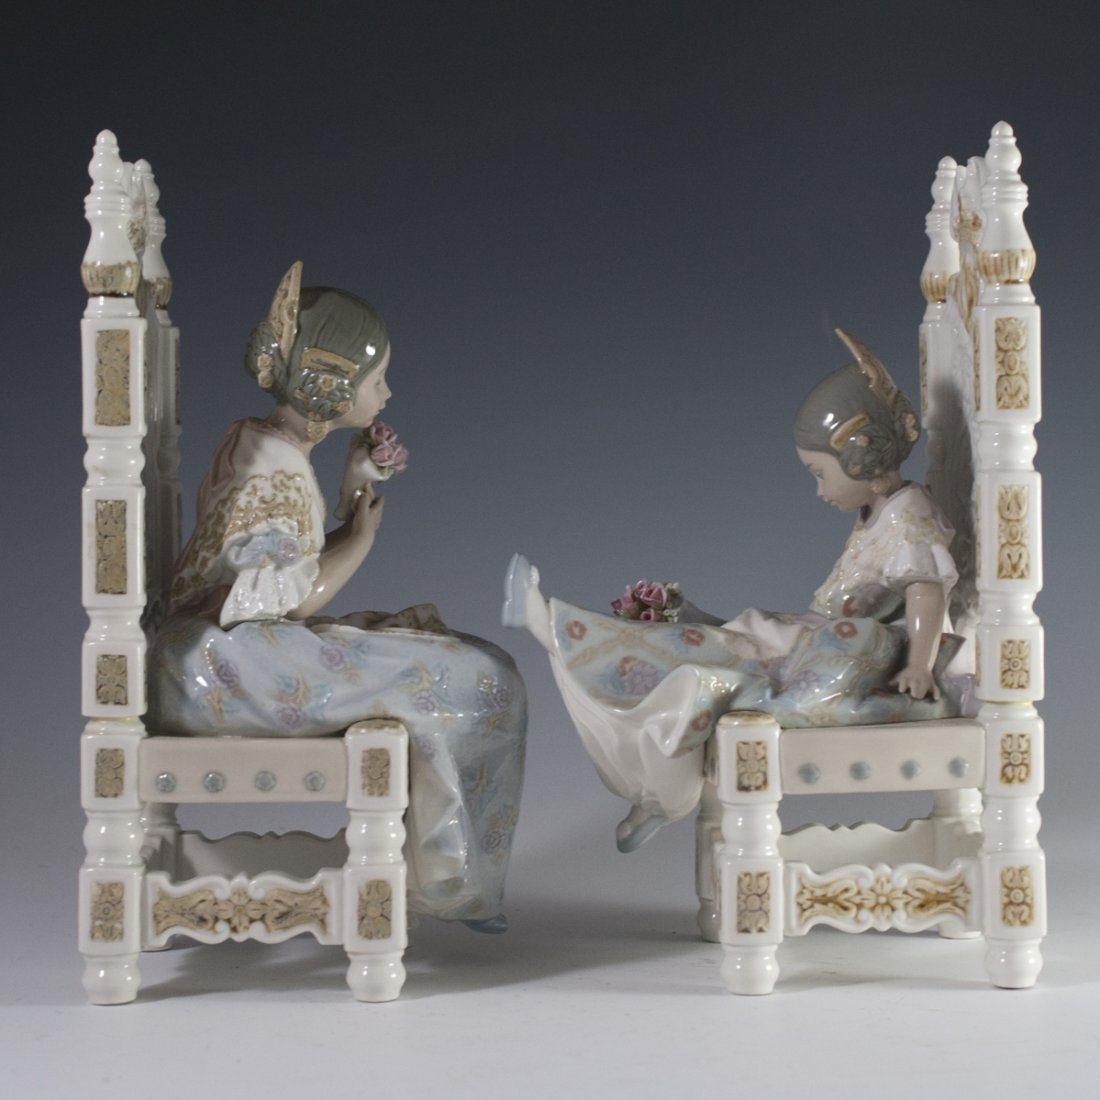 Lladro Porcelain Figurines - 2